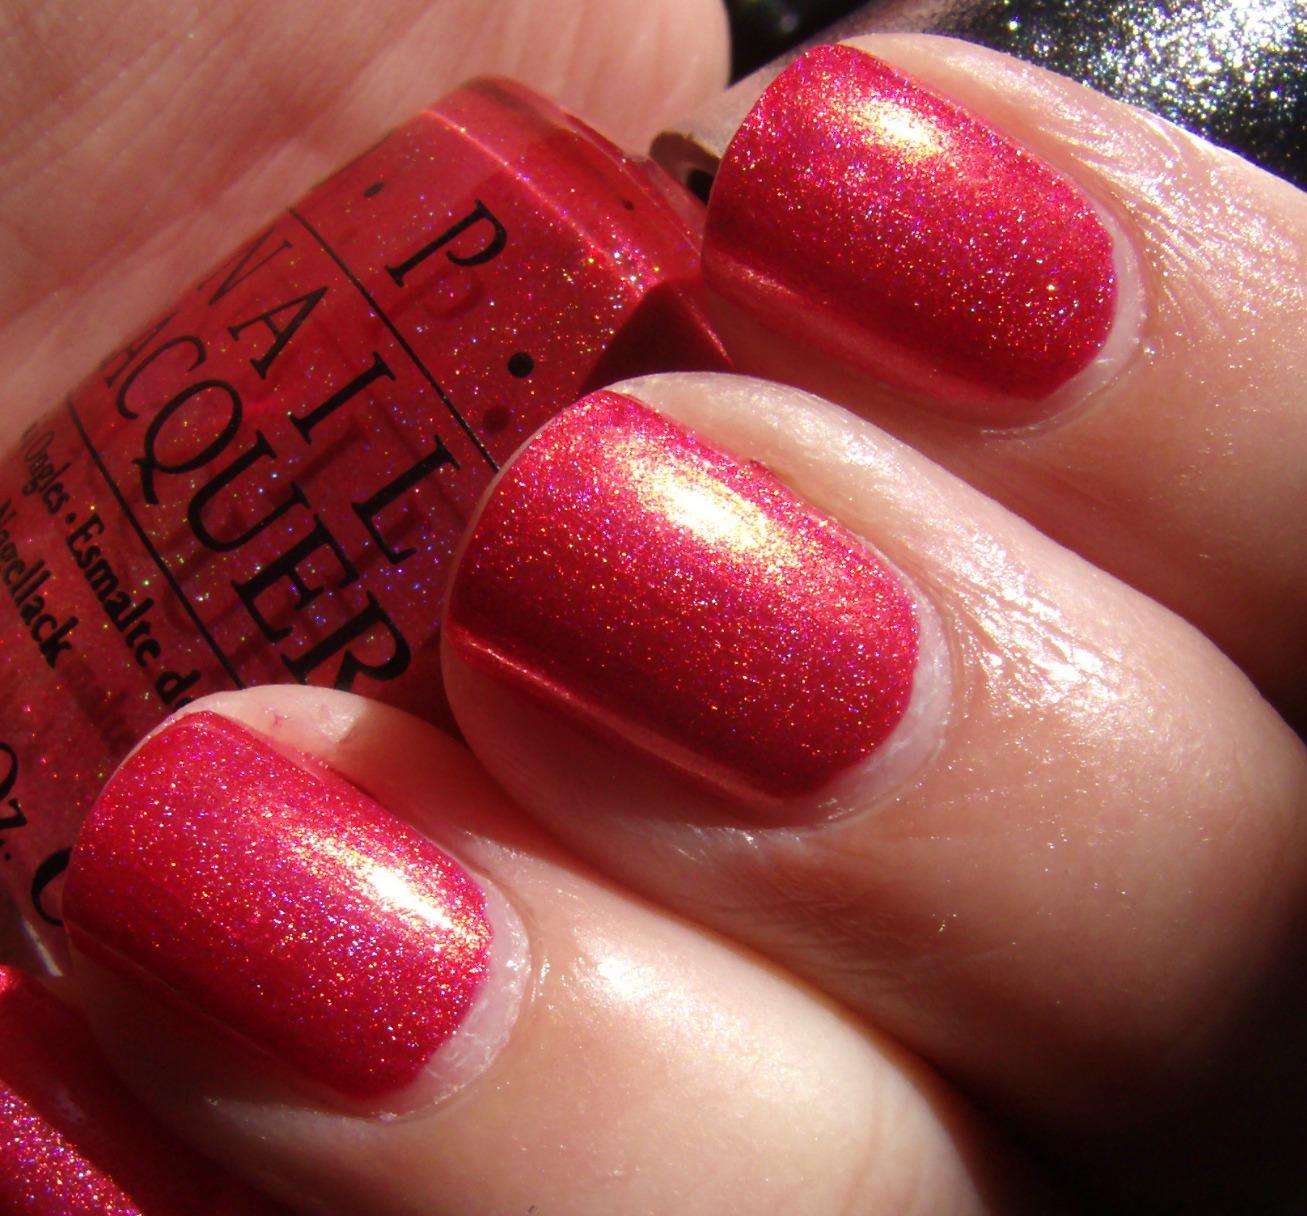 Ruby Nail Polish: Obsessive Cosmetic Hoarders Unite!: OPI Designer Series DS